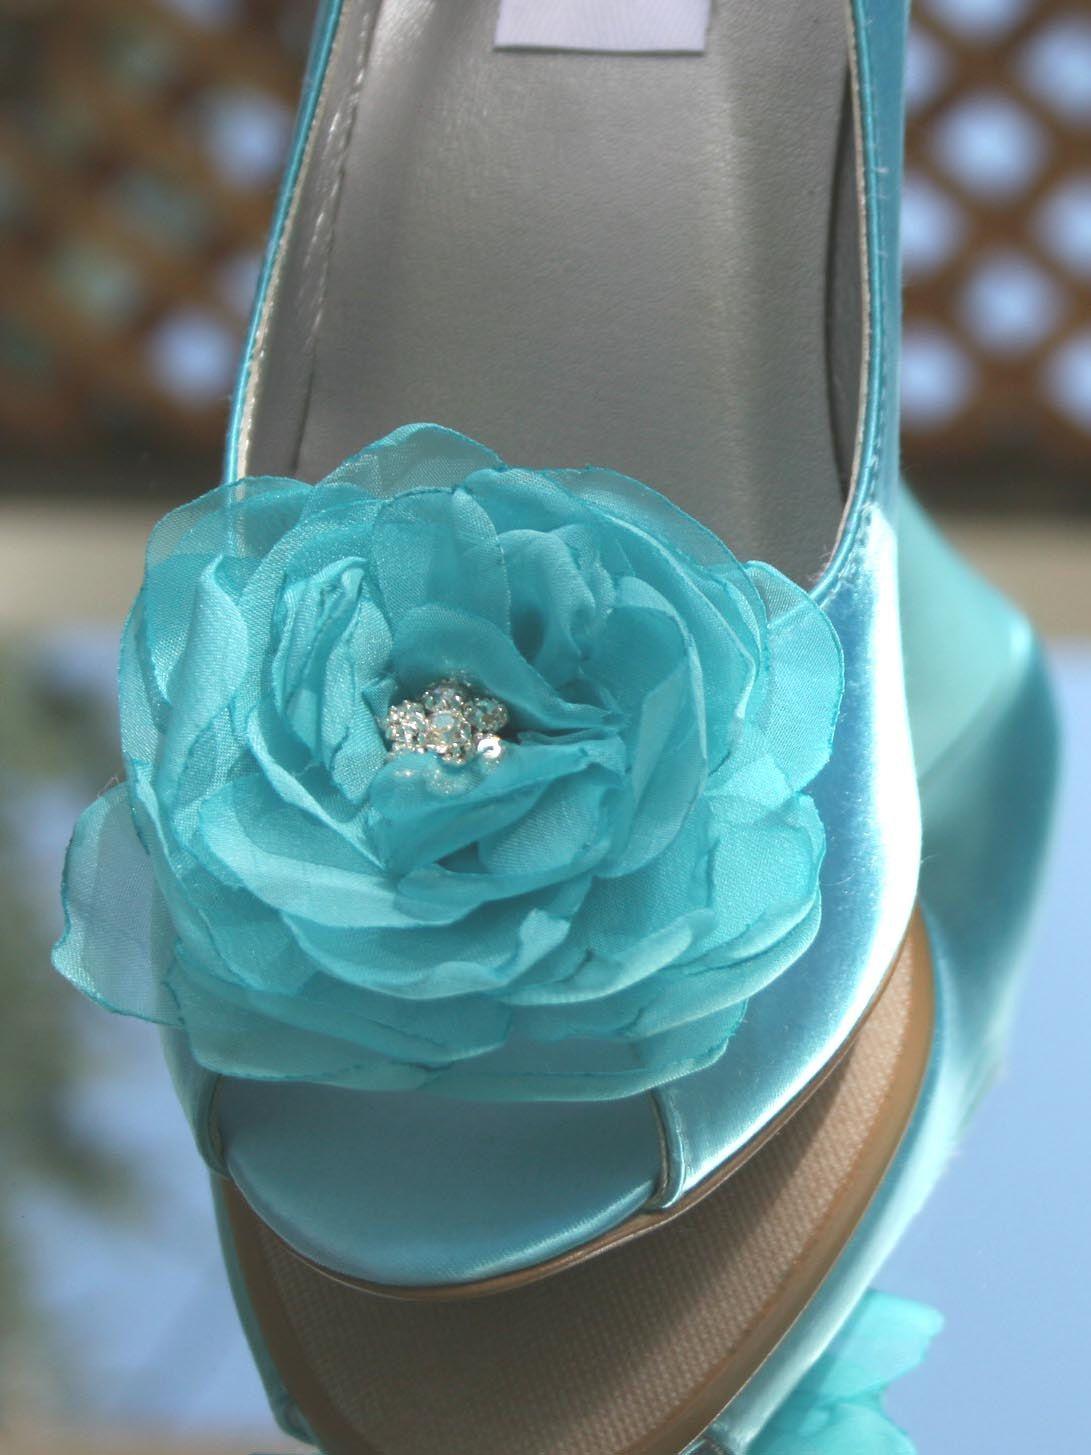 Wedding shoes tiffany blue satin peeptoes wedges with matching wedding shoes tiffany blue satin peeptoes wedges with matching tiffany blue flower adornment izmirmasajfo